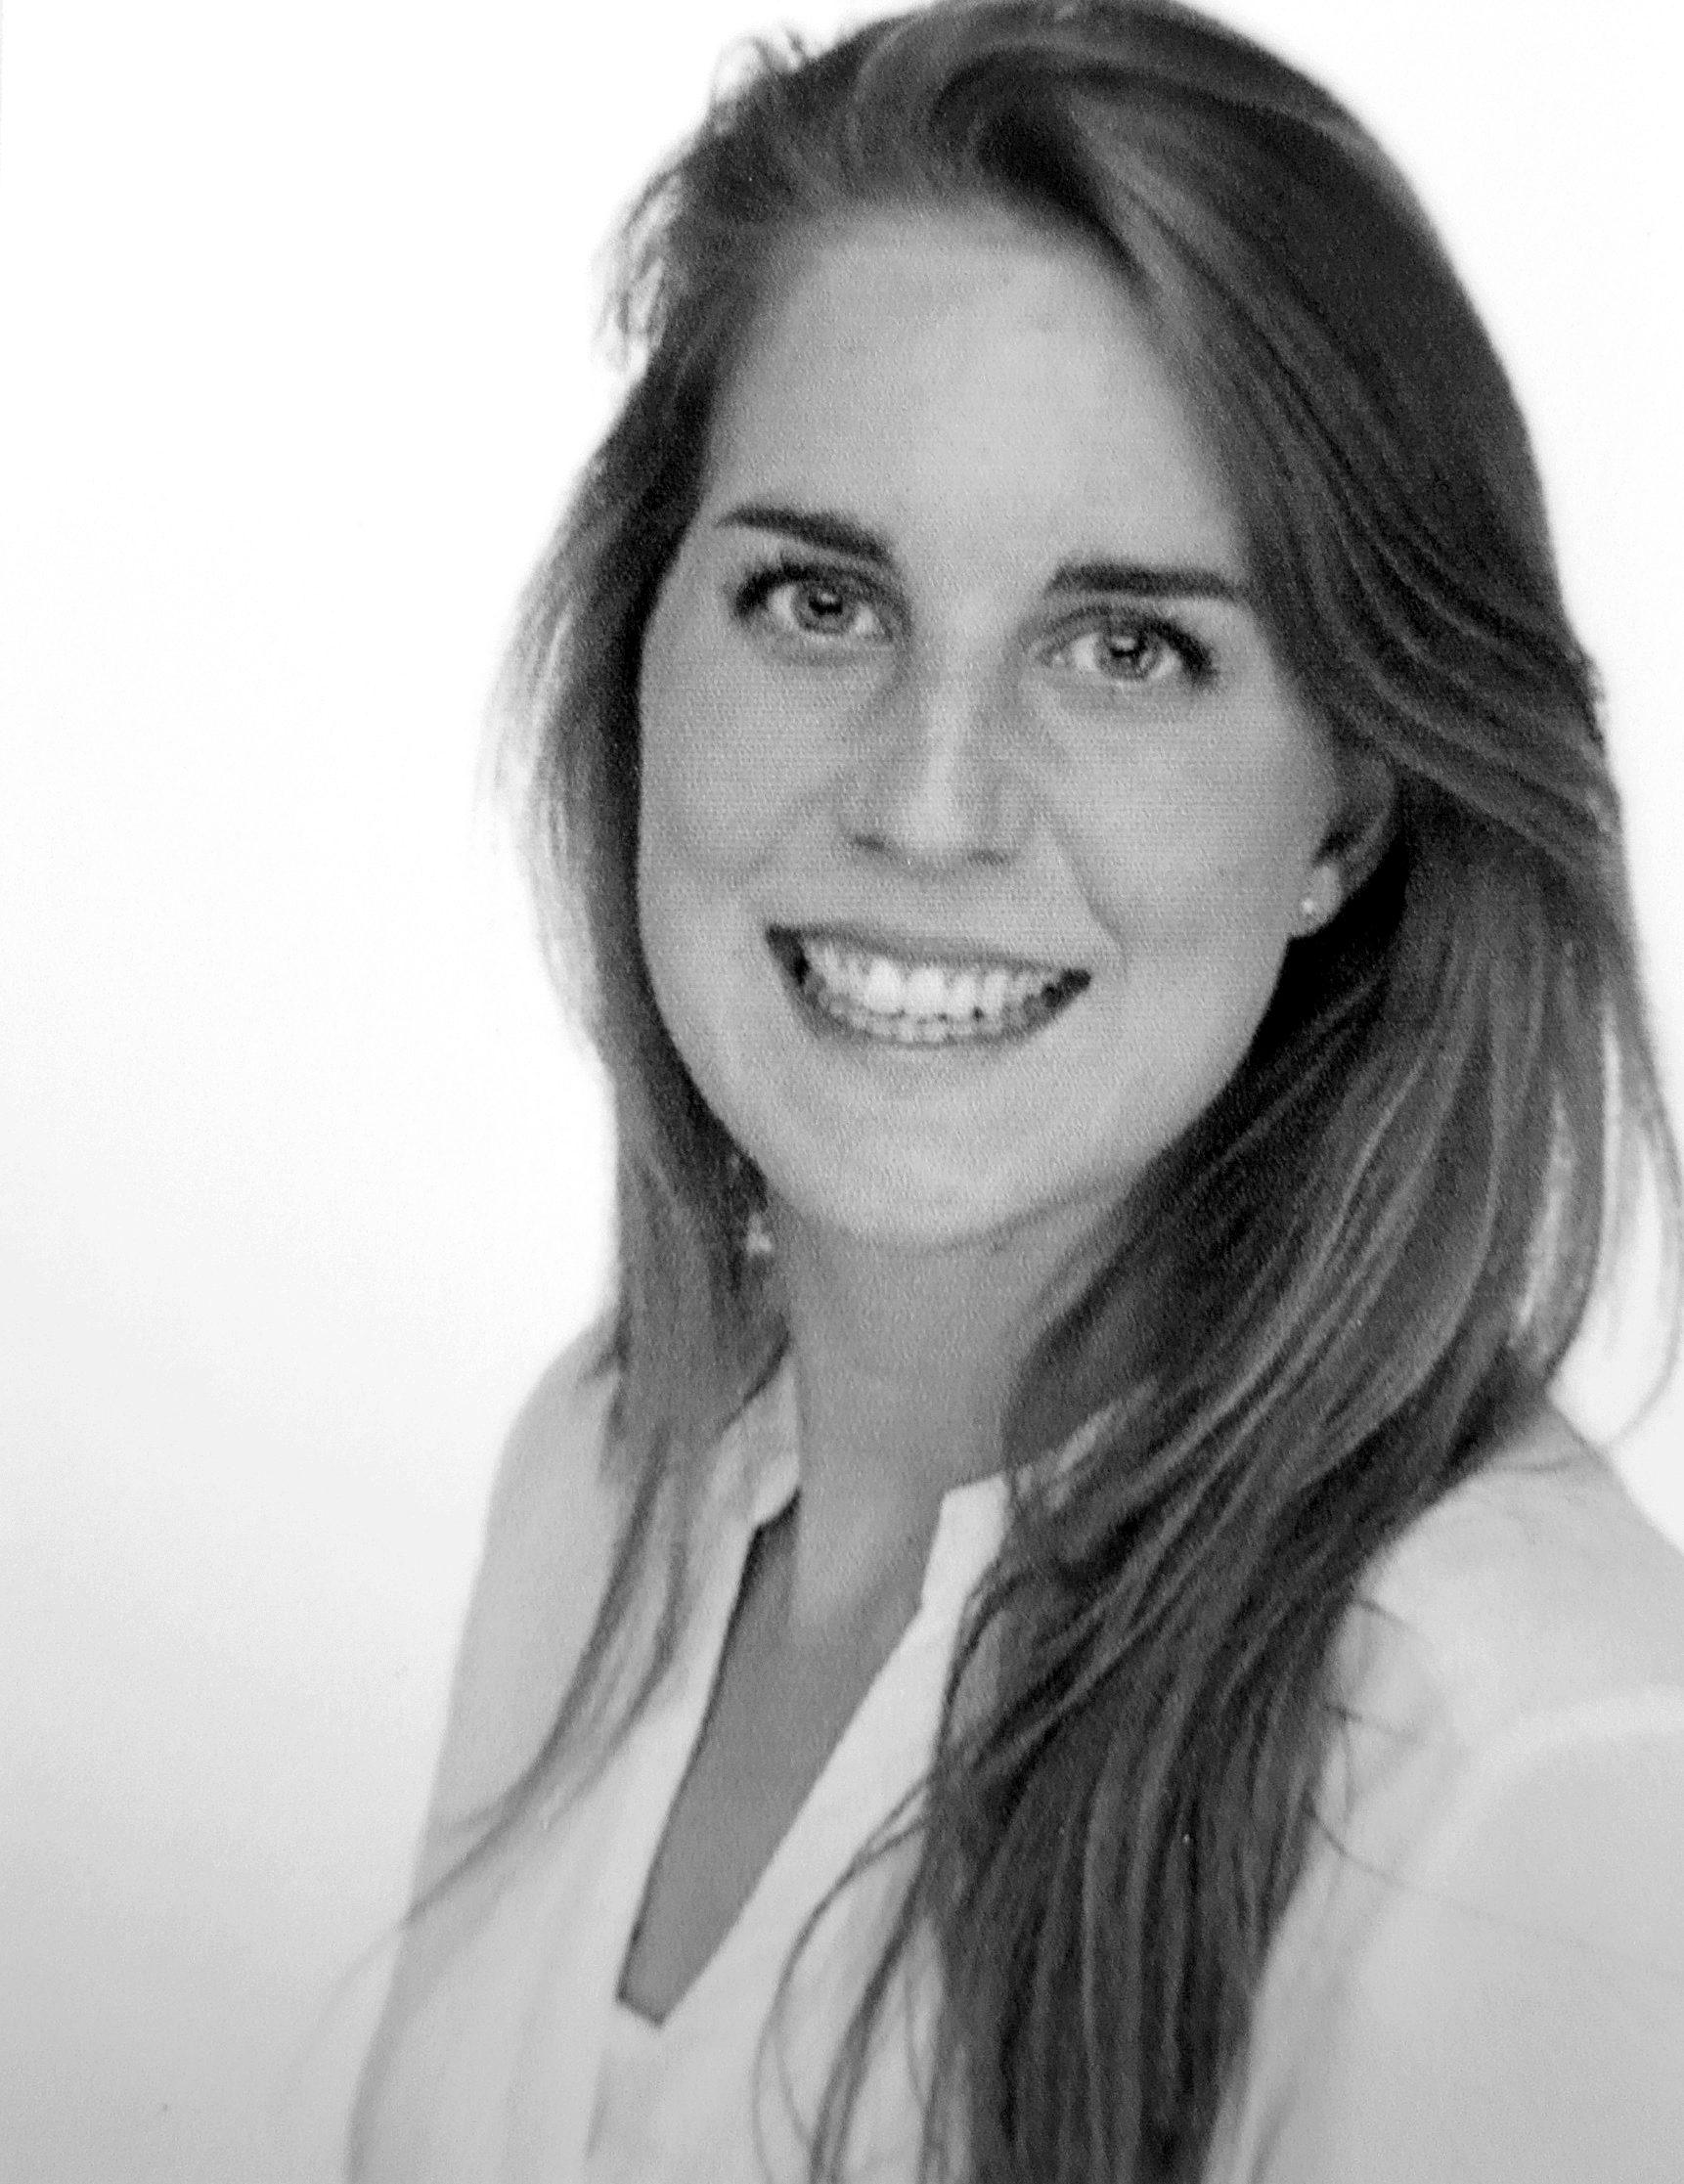 Sarah Tiecks